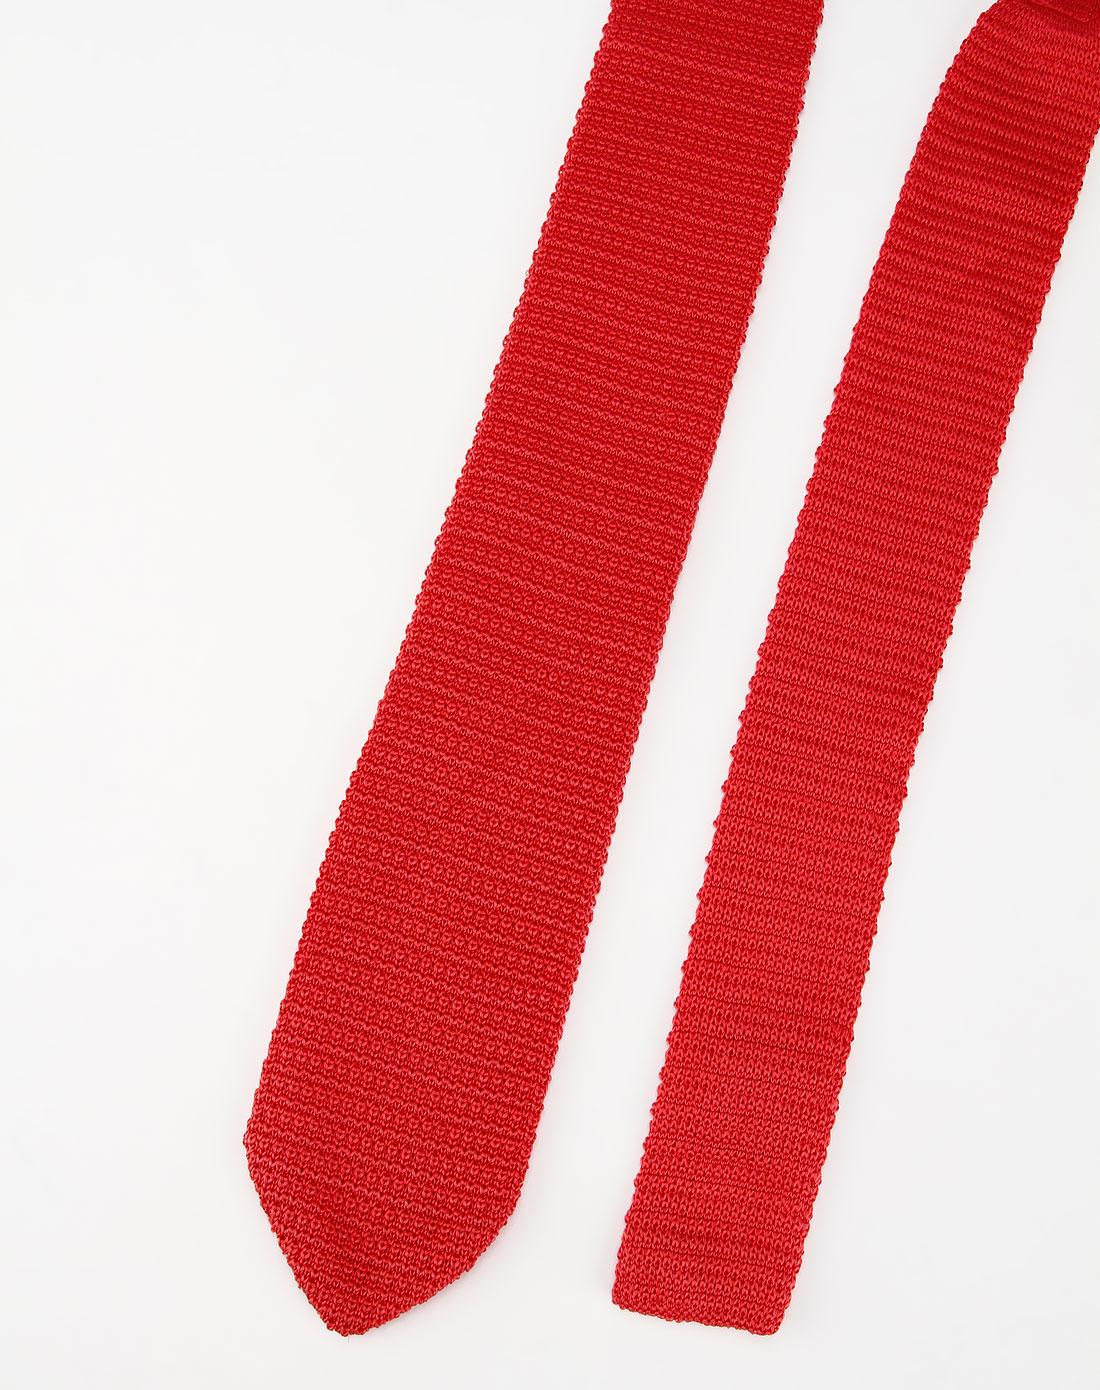 hazzys-男装西瓜红色针织时尚领带